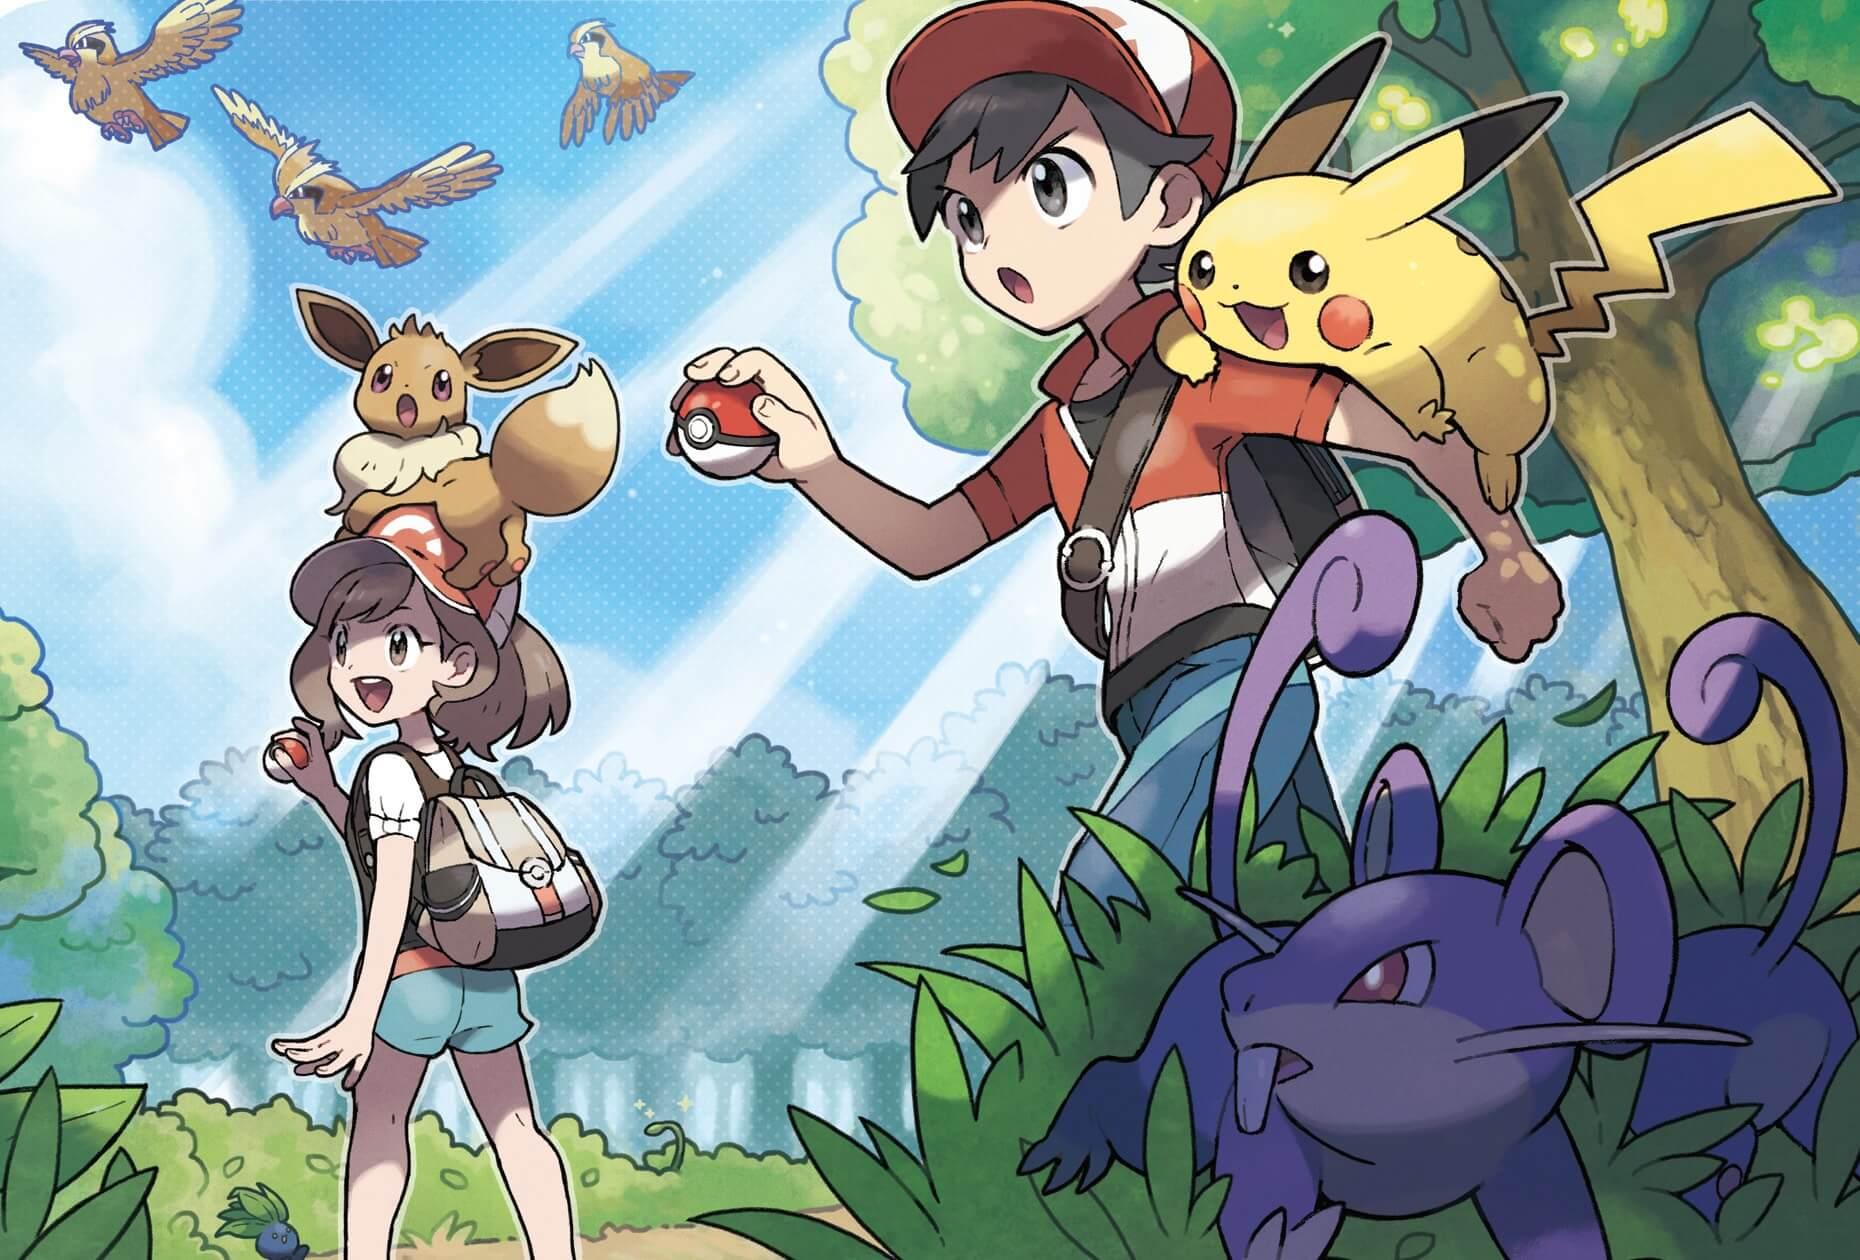 Should you play Pokémon: Let's Go, Pikachu or Eevee?